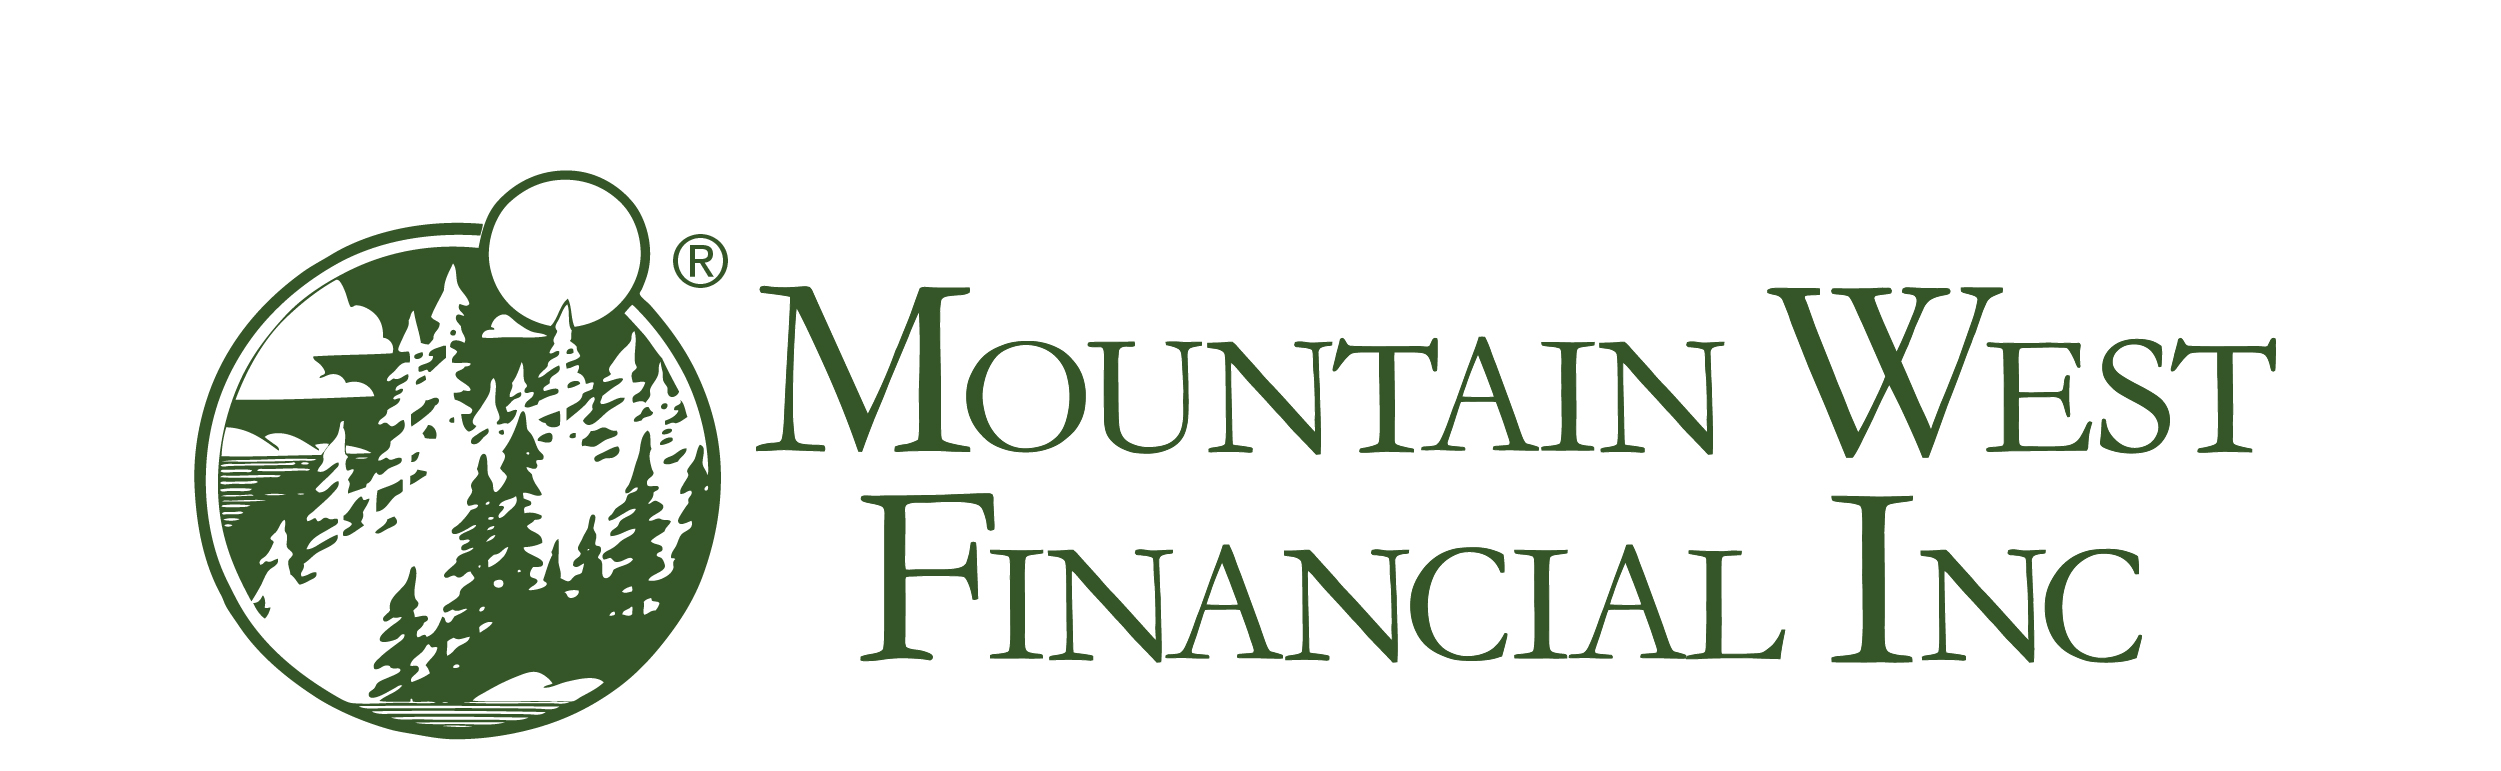 Mountain West Financial, Inc. logo